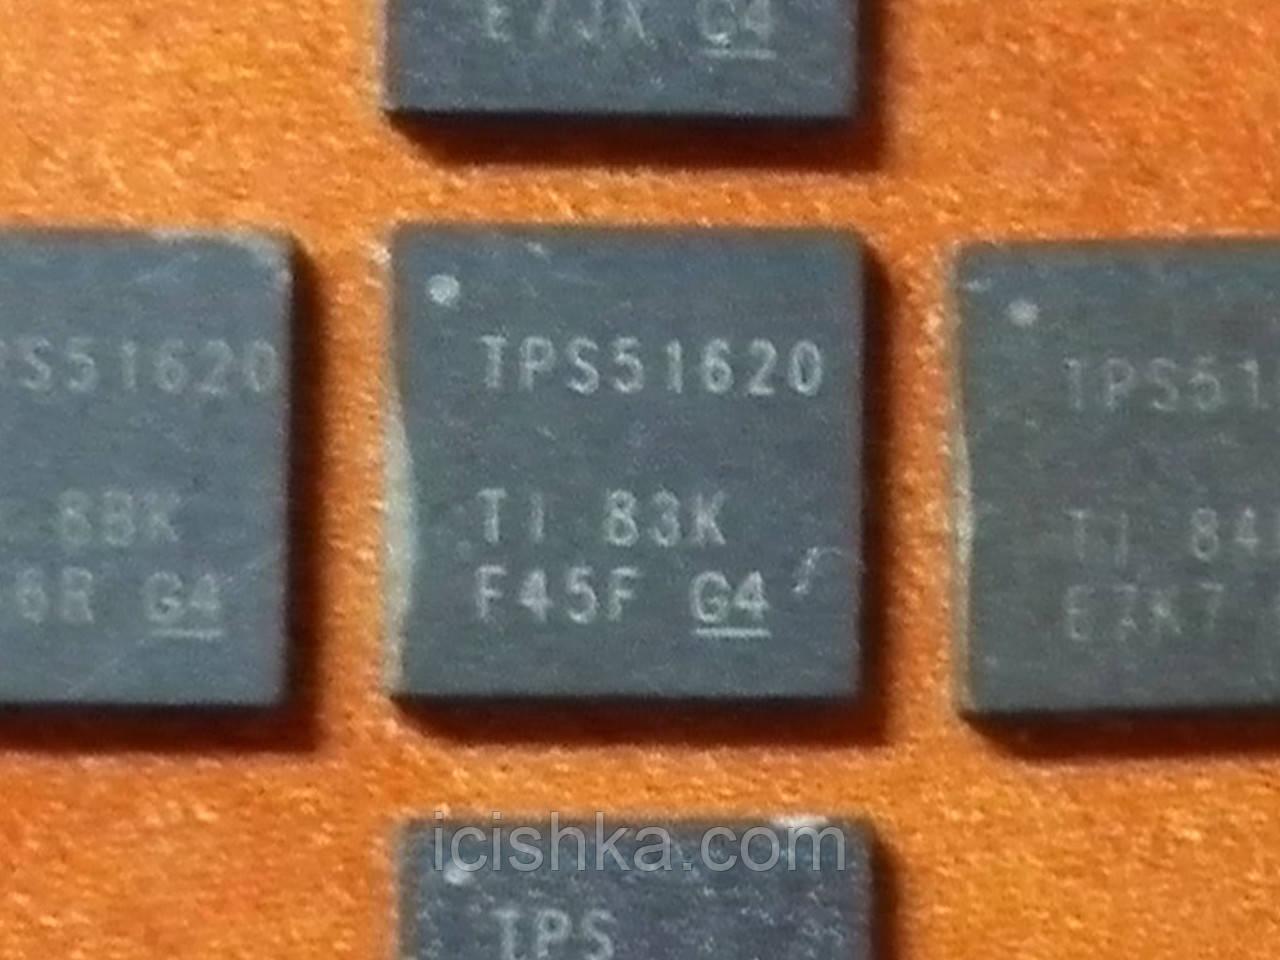 TPS51620 / 51620 QFN40 Step Down for IMVP6+ CPU/GPU